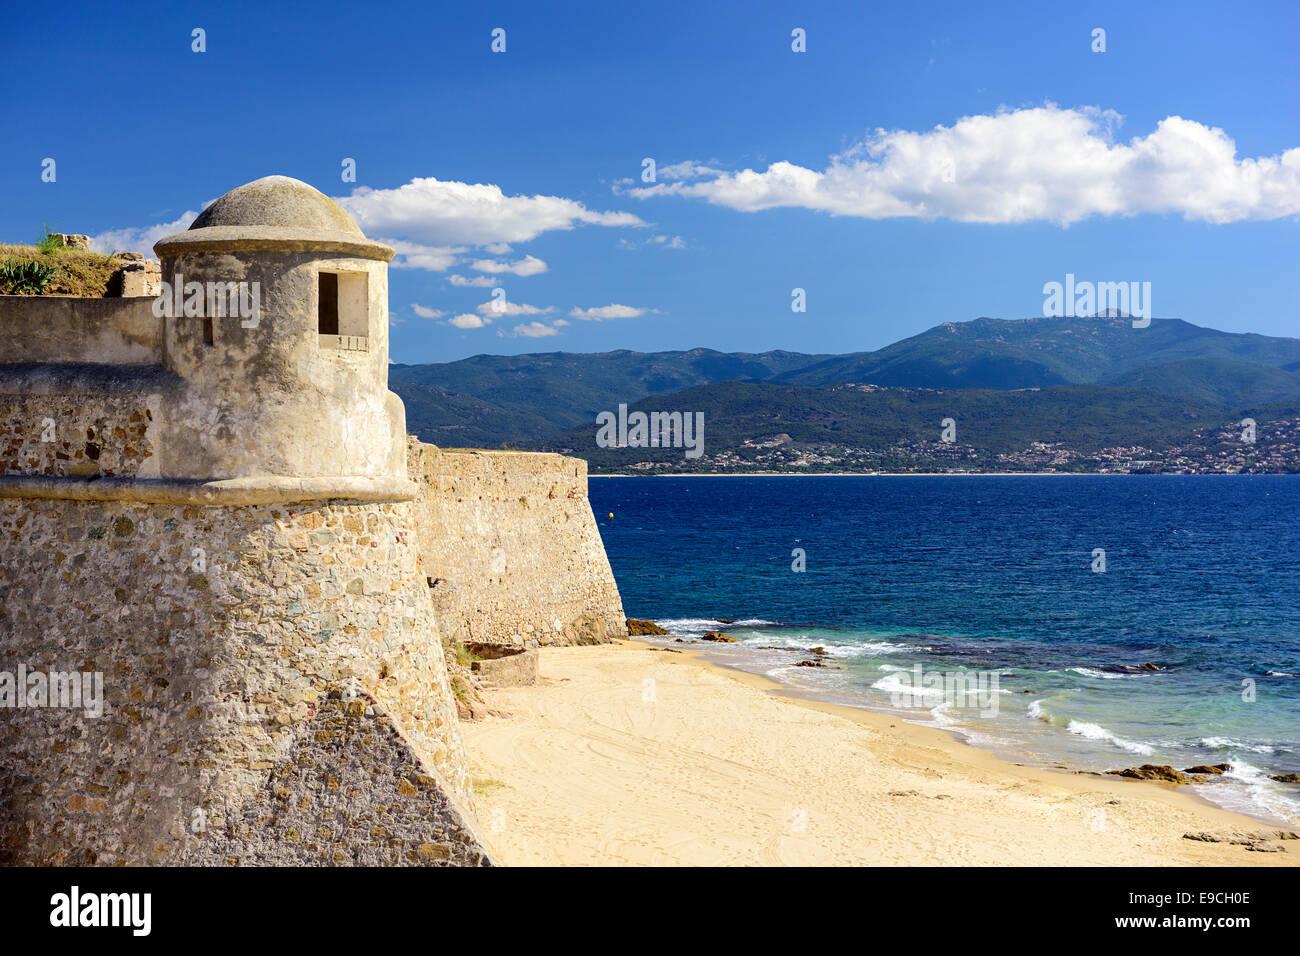 Korsika, Frankreich Zitadelle Miollis am Strand. Stockbild